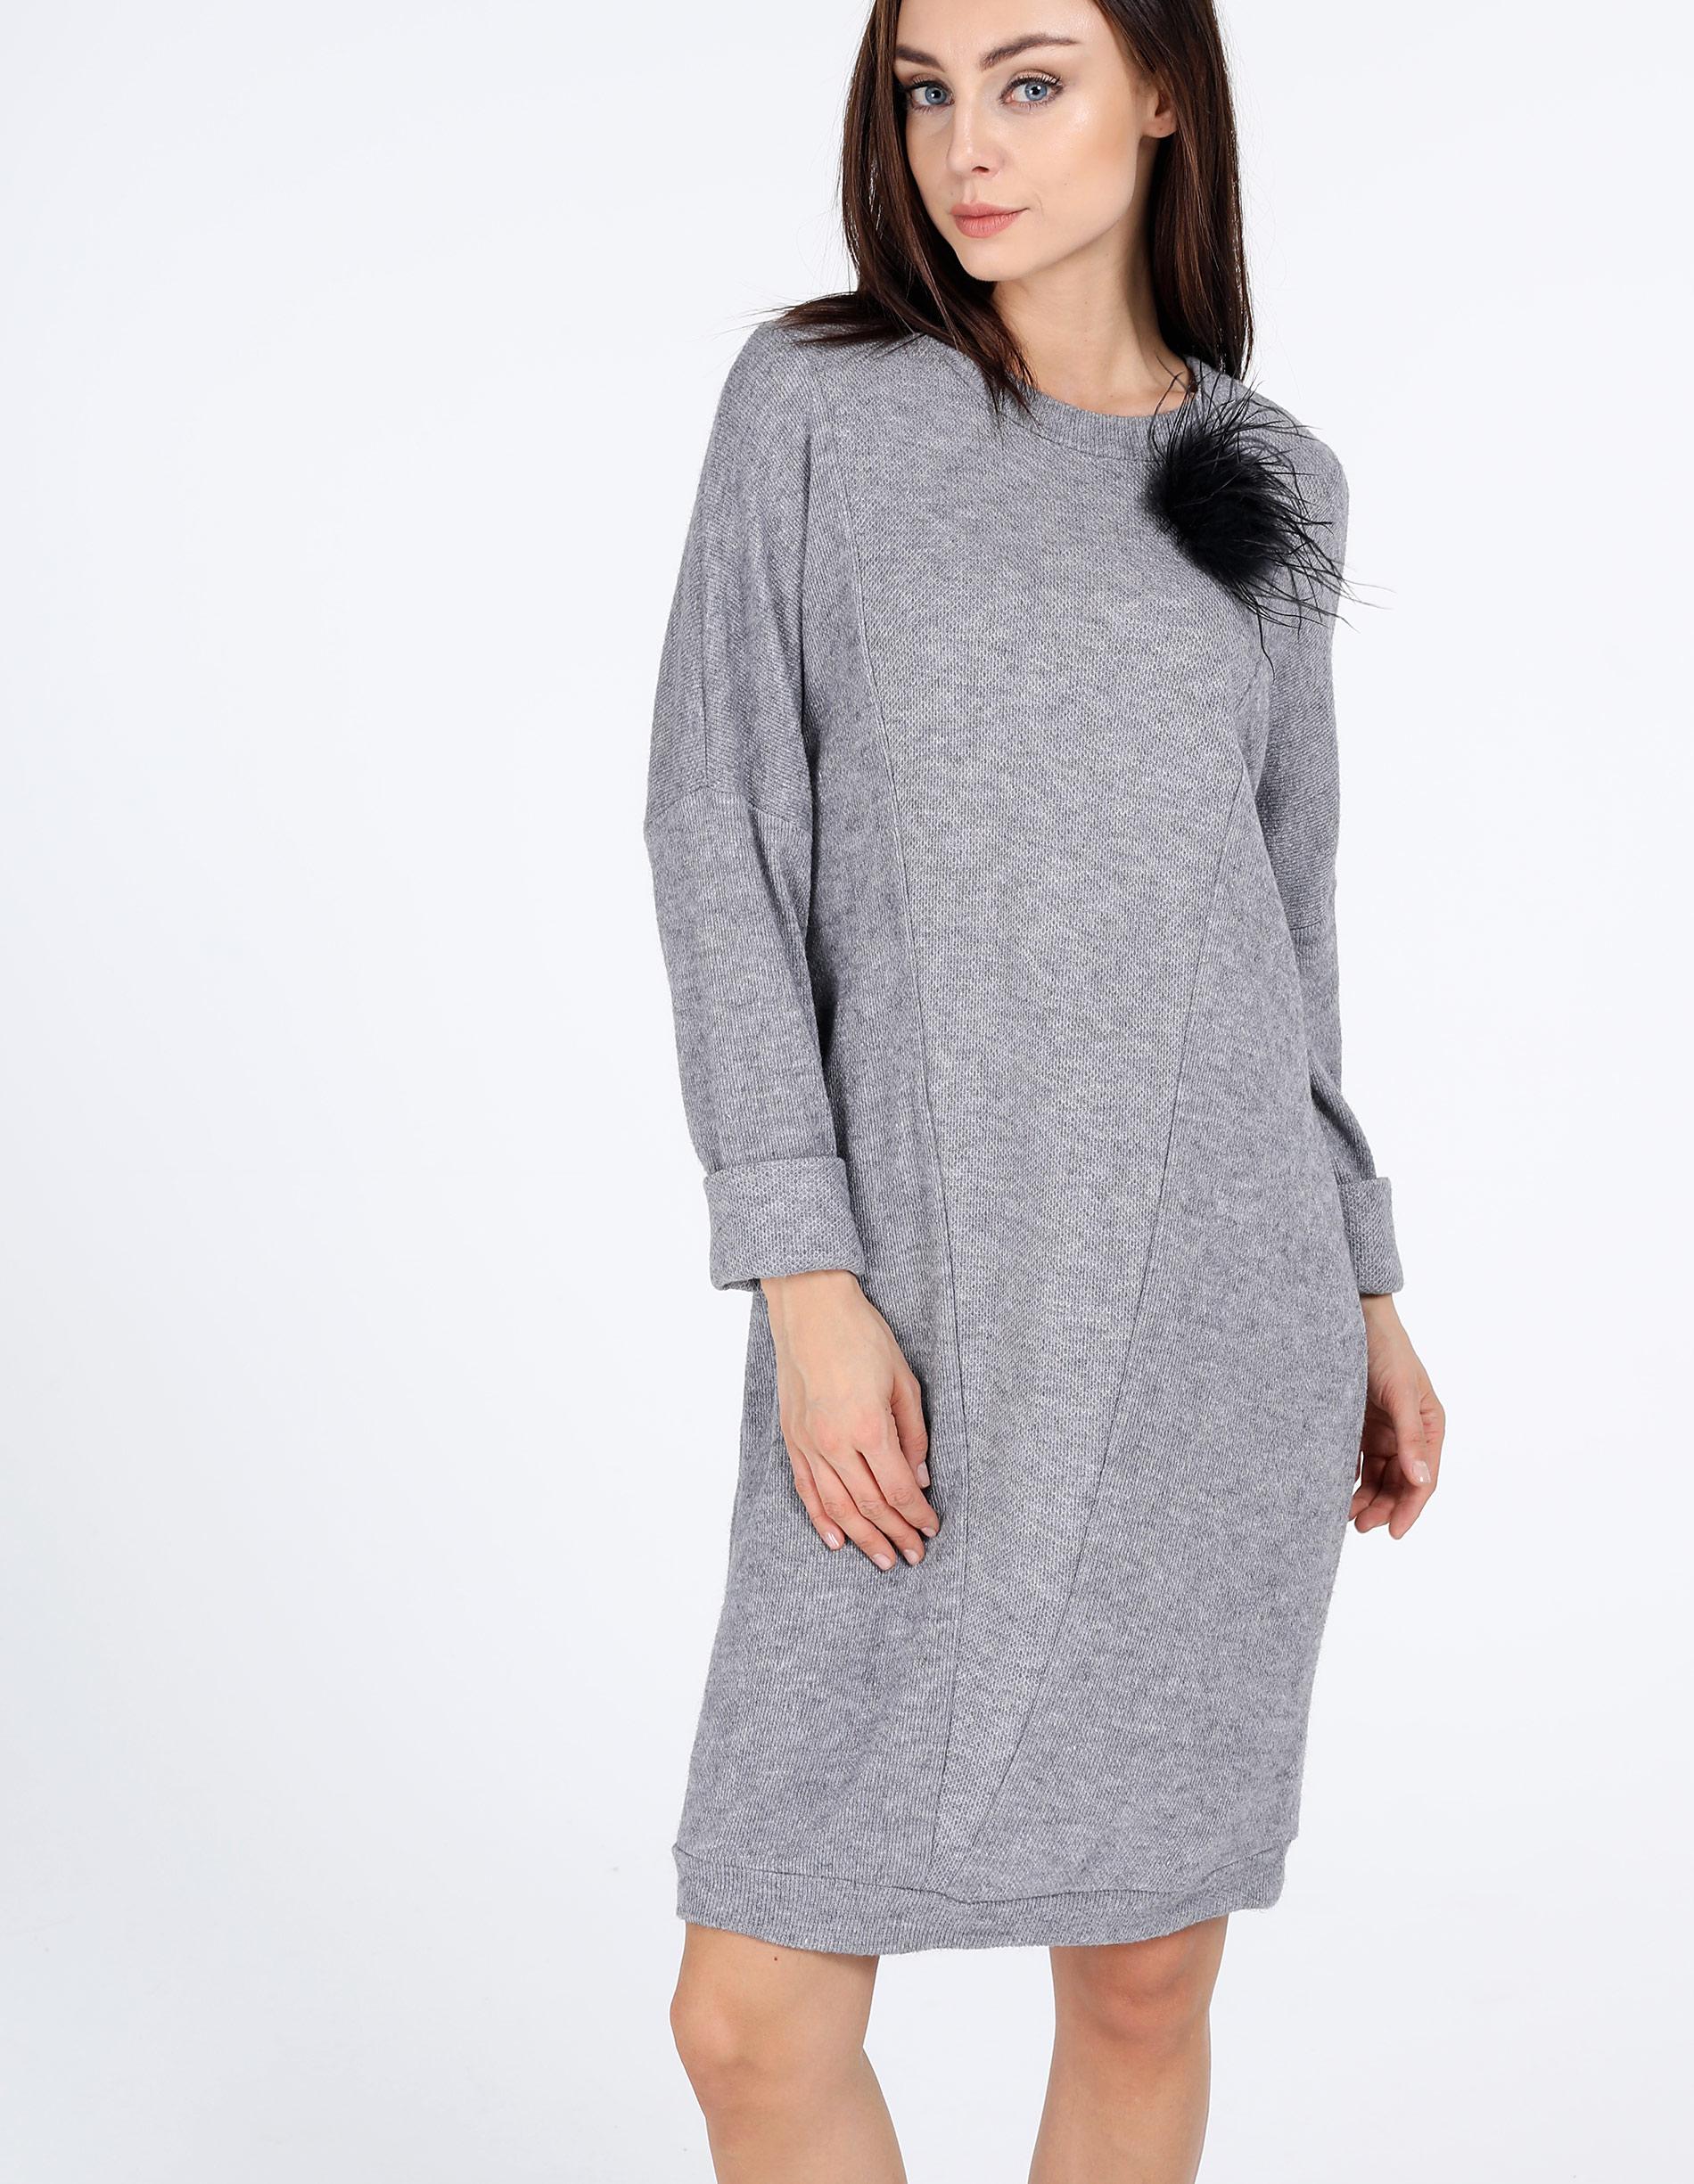 Sukienka - 96-21745 GRIG - Unisono